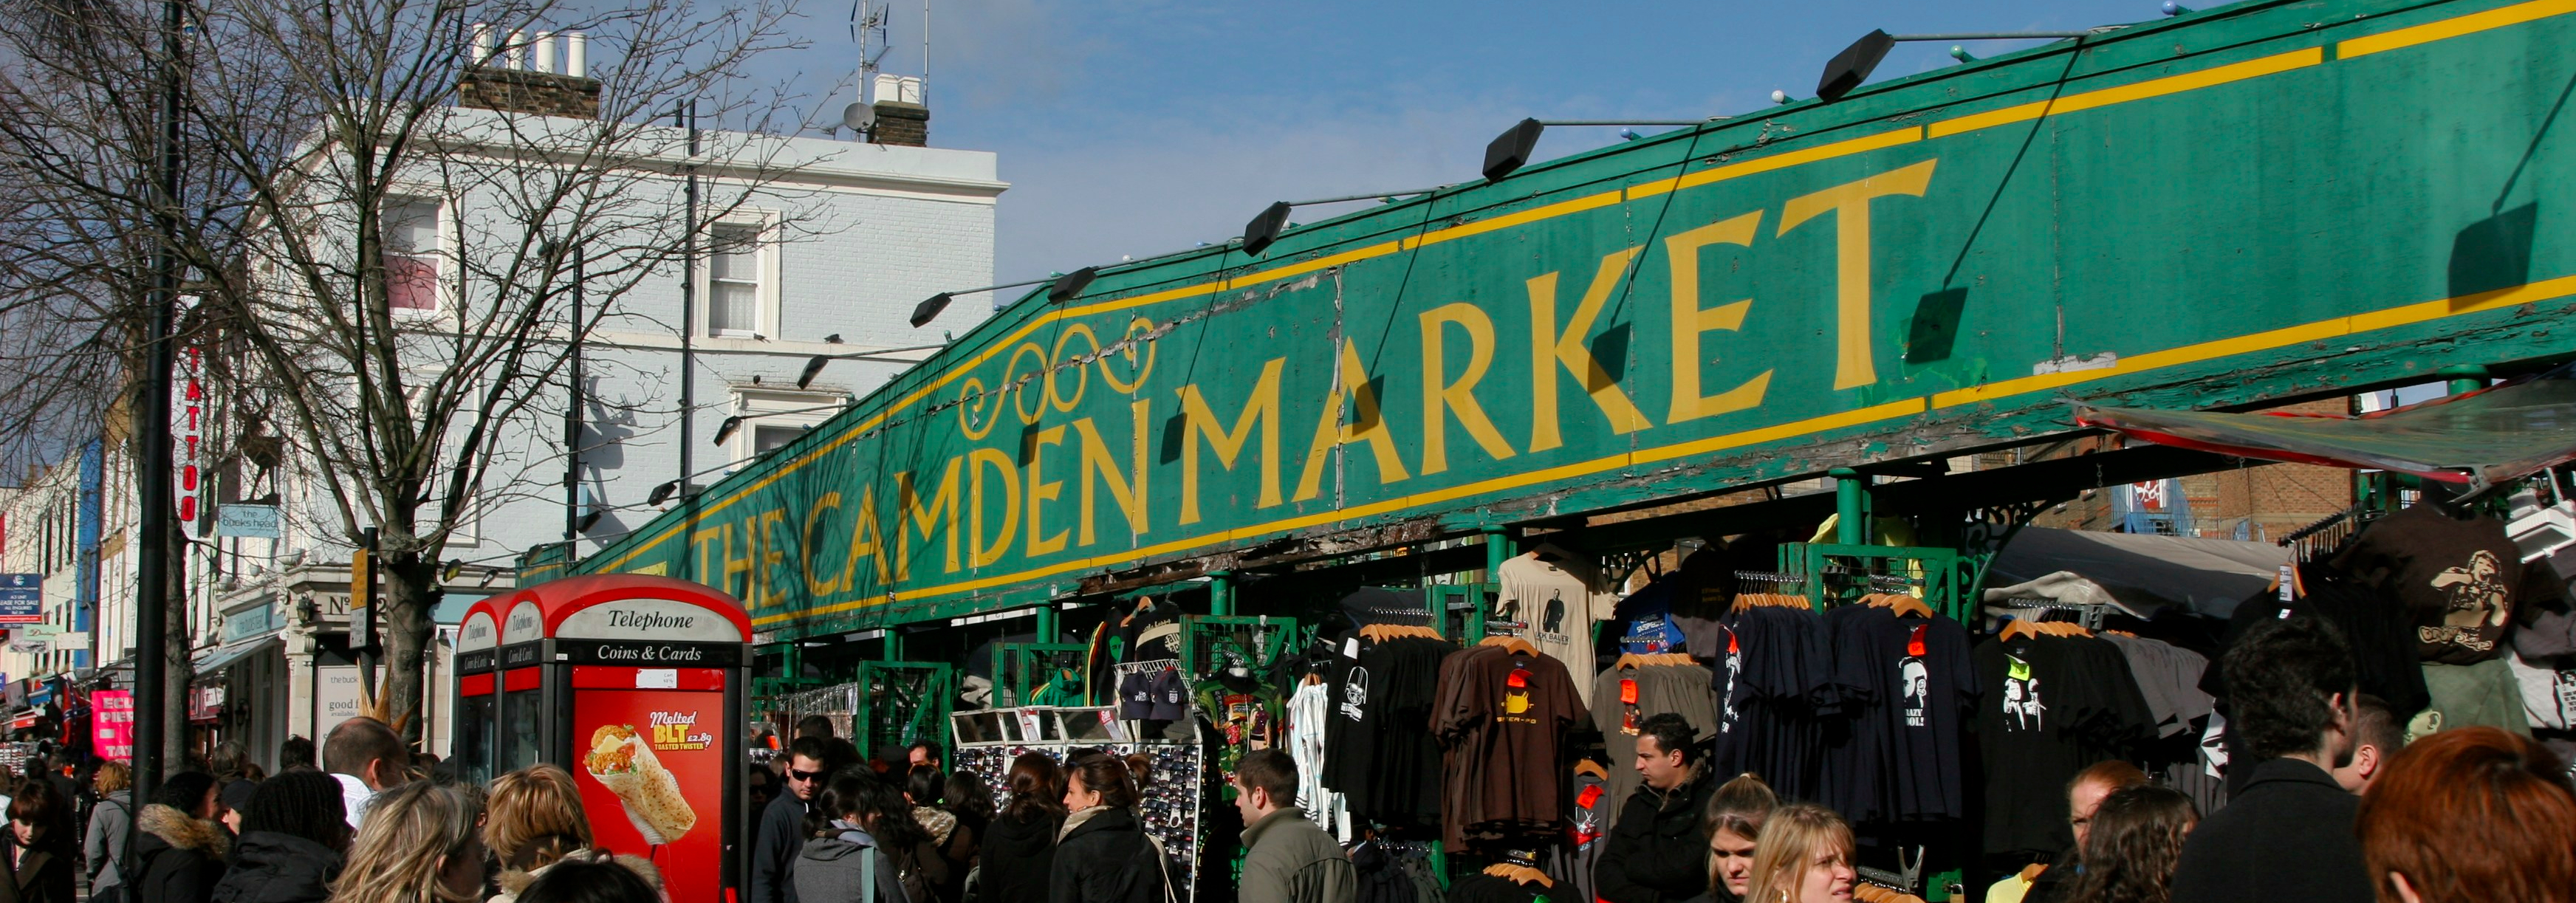 Camden Market - Foto: Phil Chambers